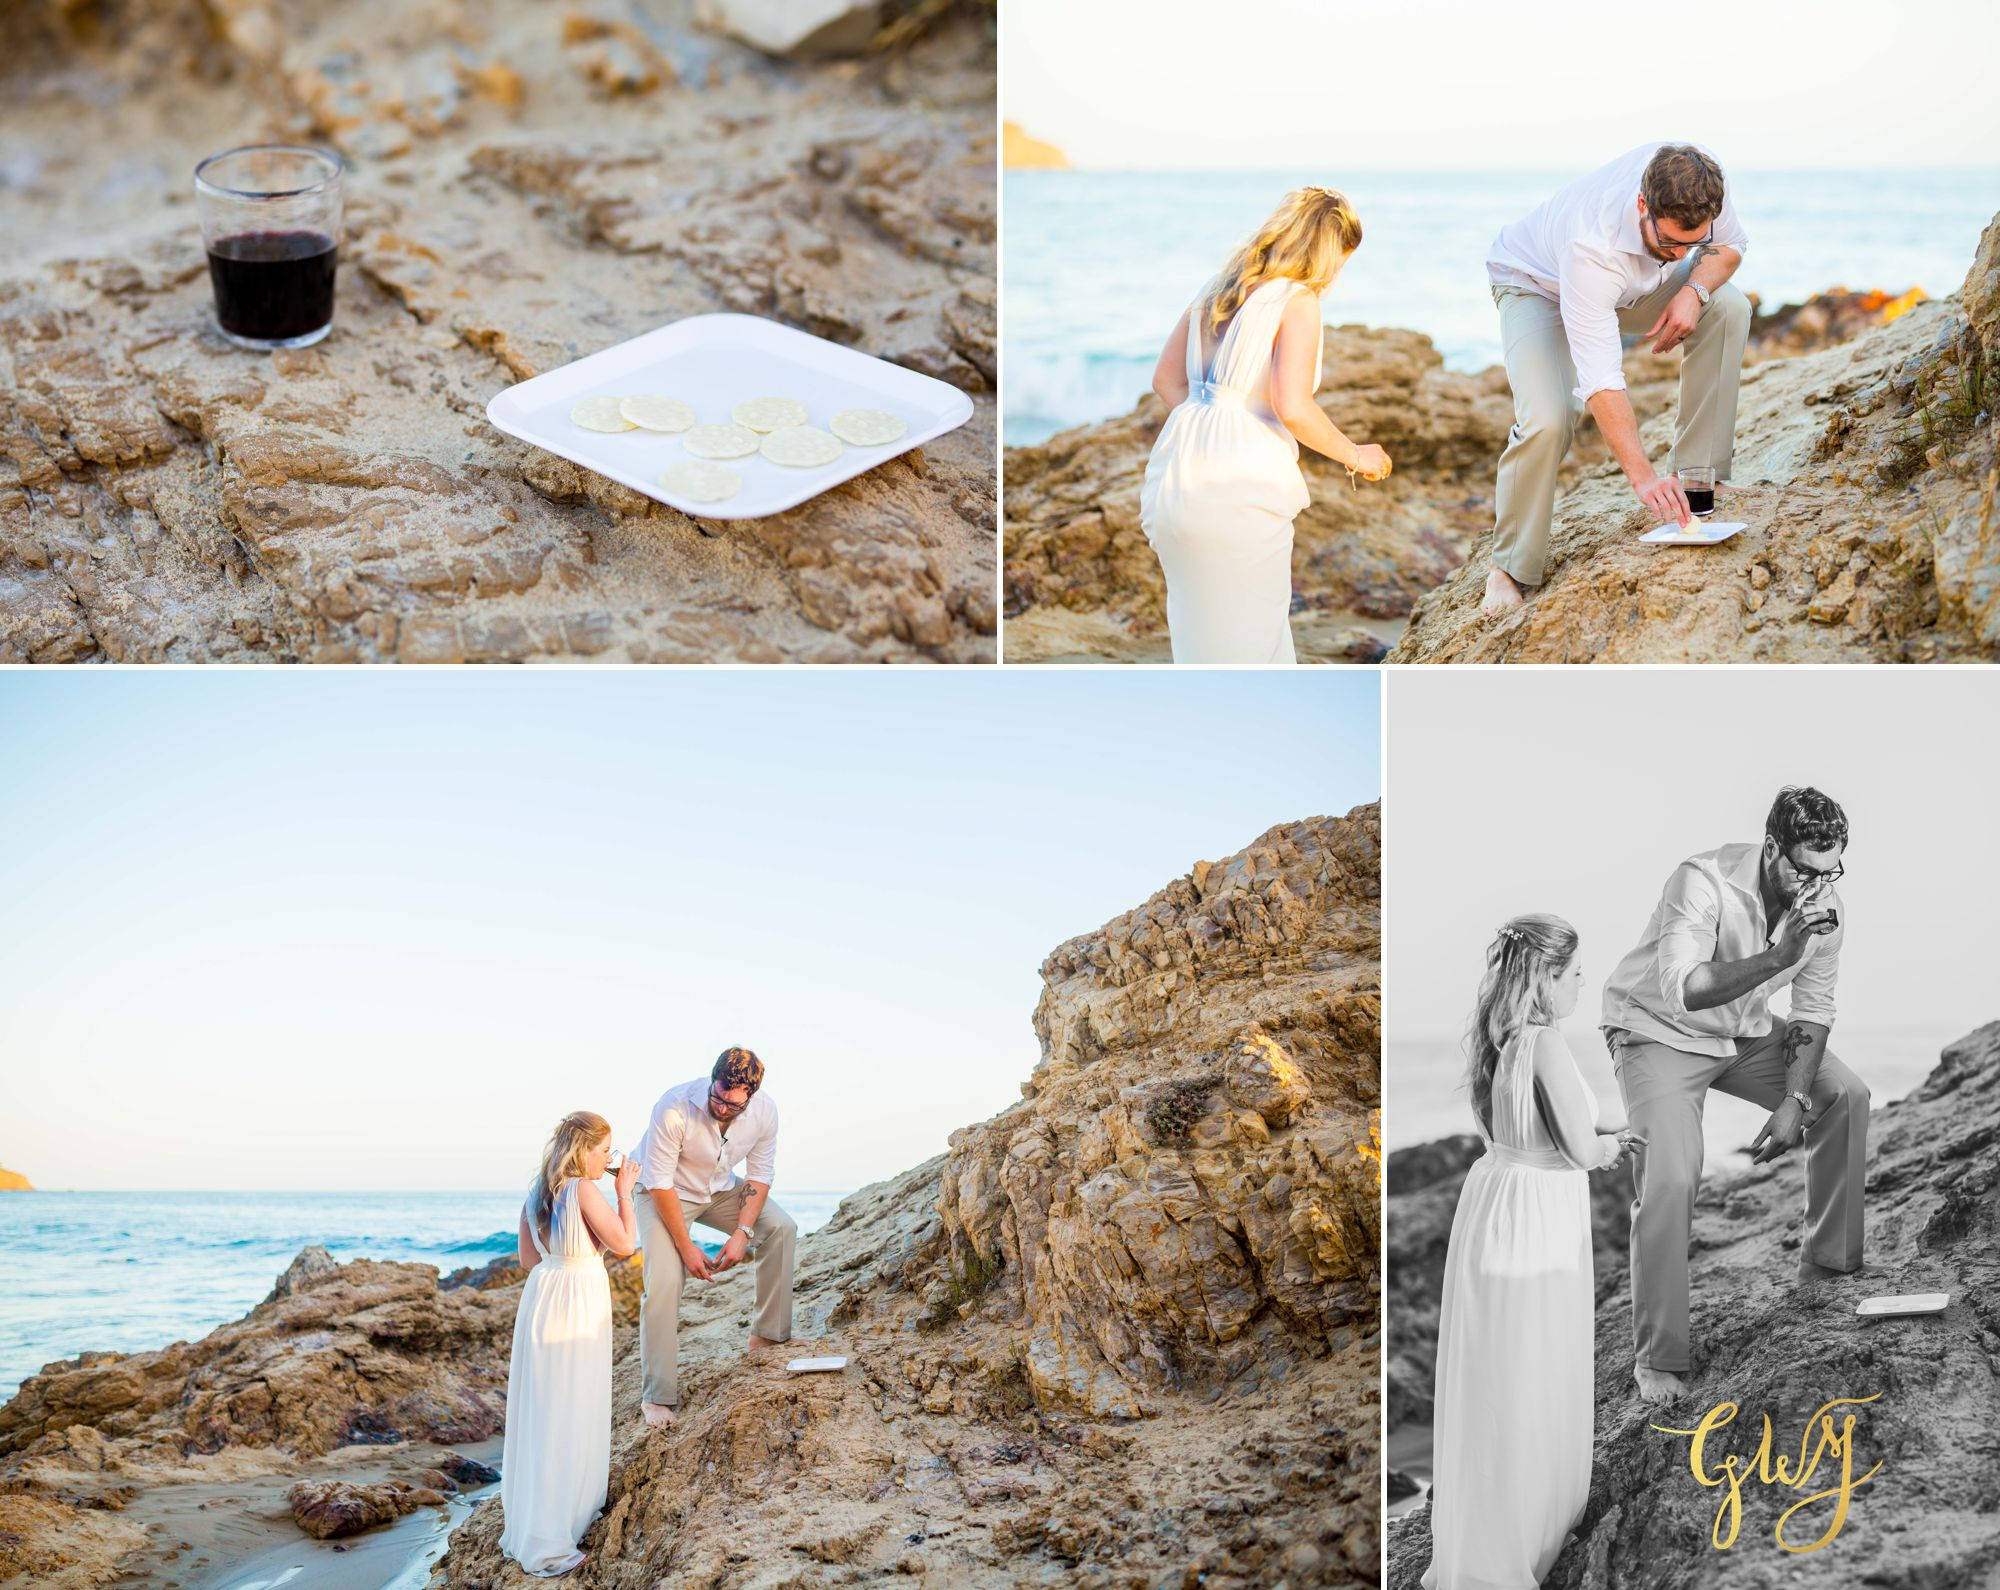 Amanda + Joe Reef Point Crystal Cove Newport Beach Sunset Romantic Intimate Elopement by Glass Woods Media 12.jpg